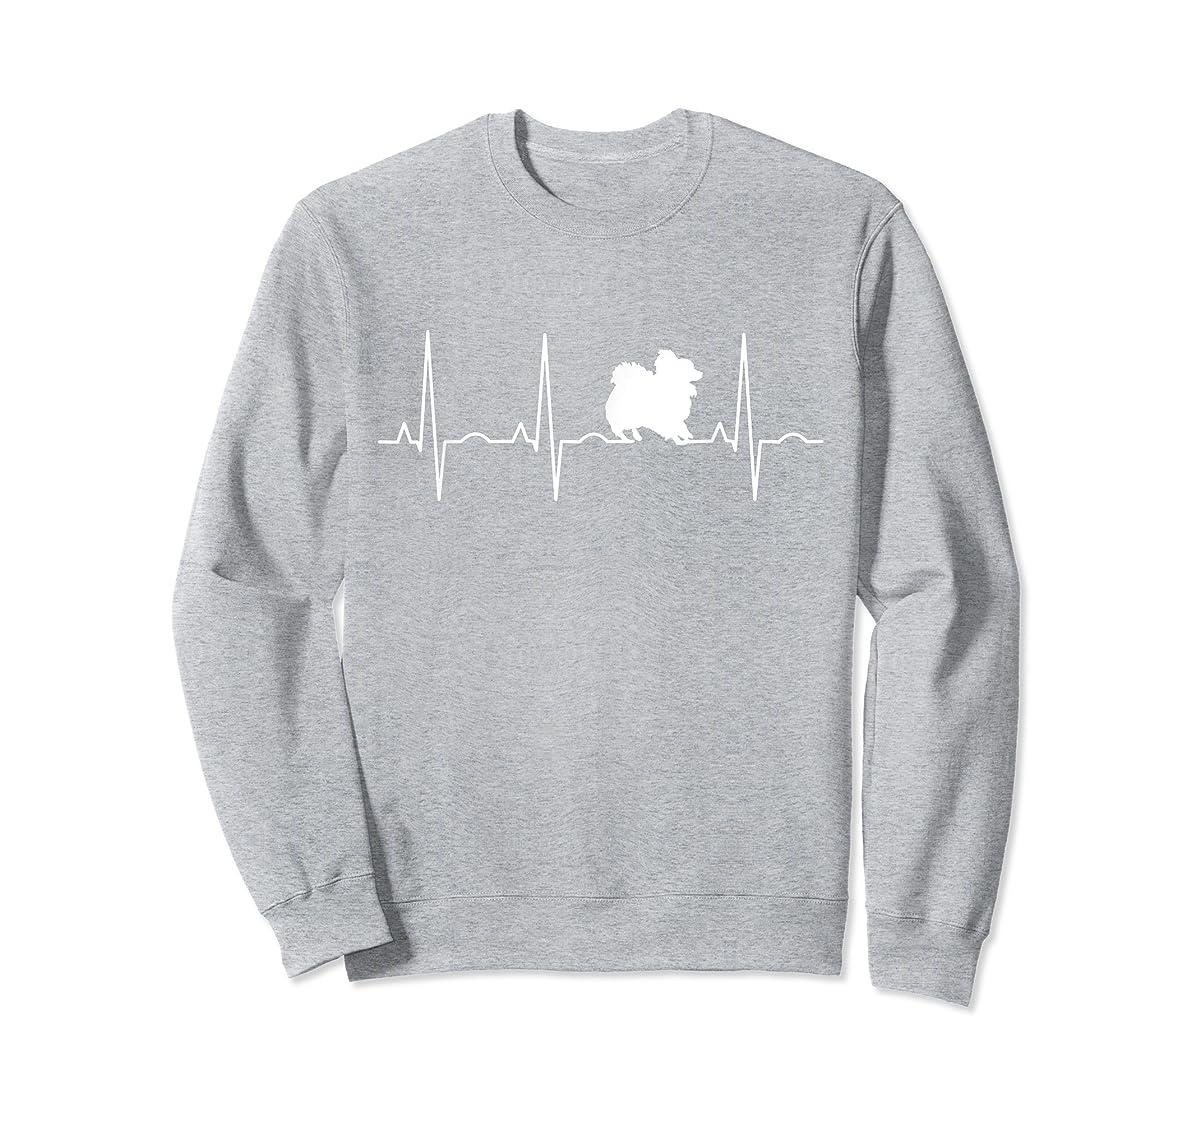 Pomeranian Heartbeat T-Shirt Pom Shirt Gifts Dog Lover-Sweatshirt-Sport Grey